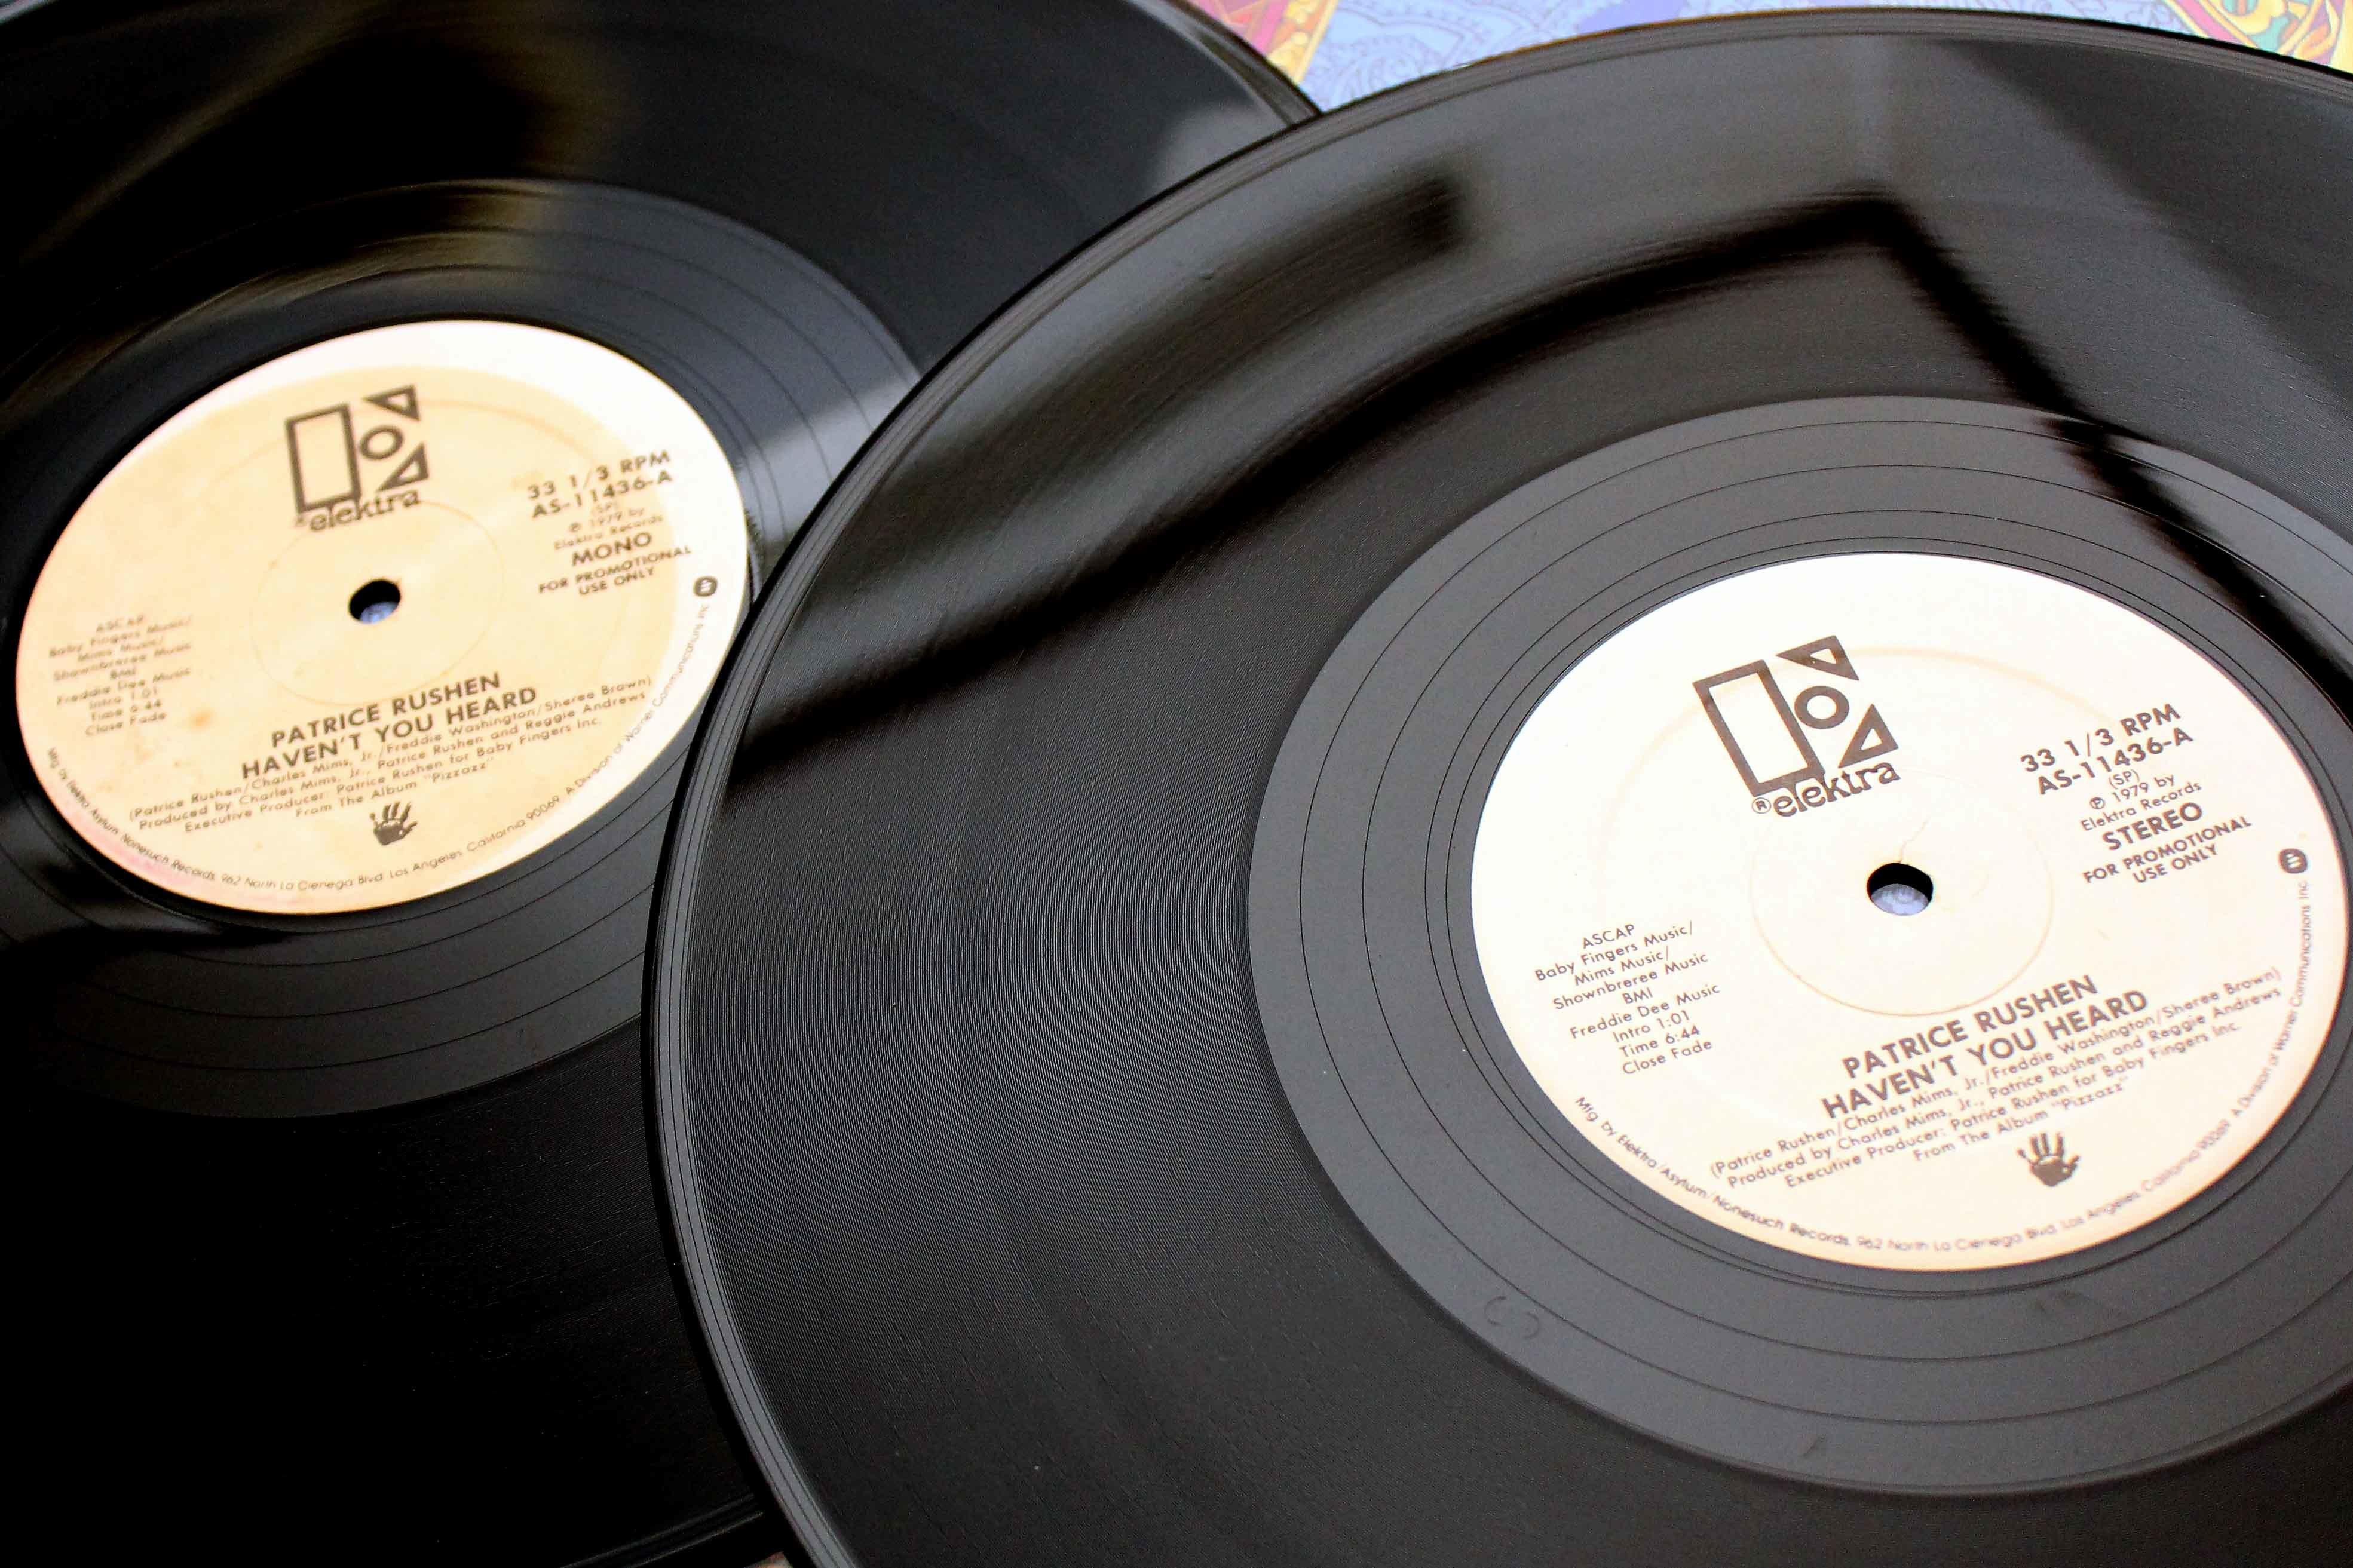 Patrice Rushen – Havent You Heard 05